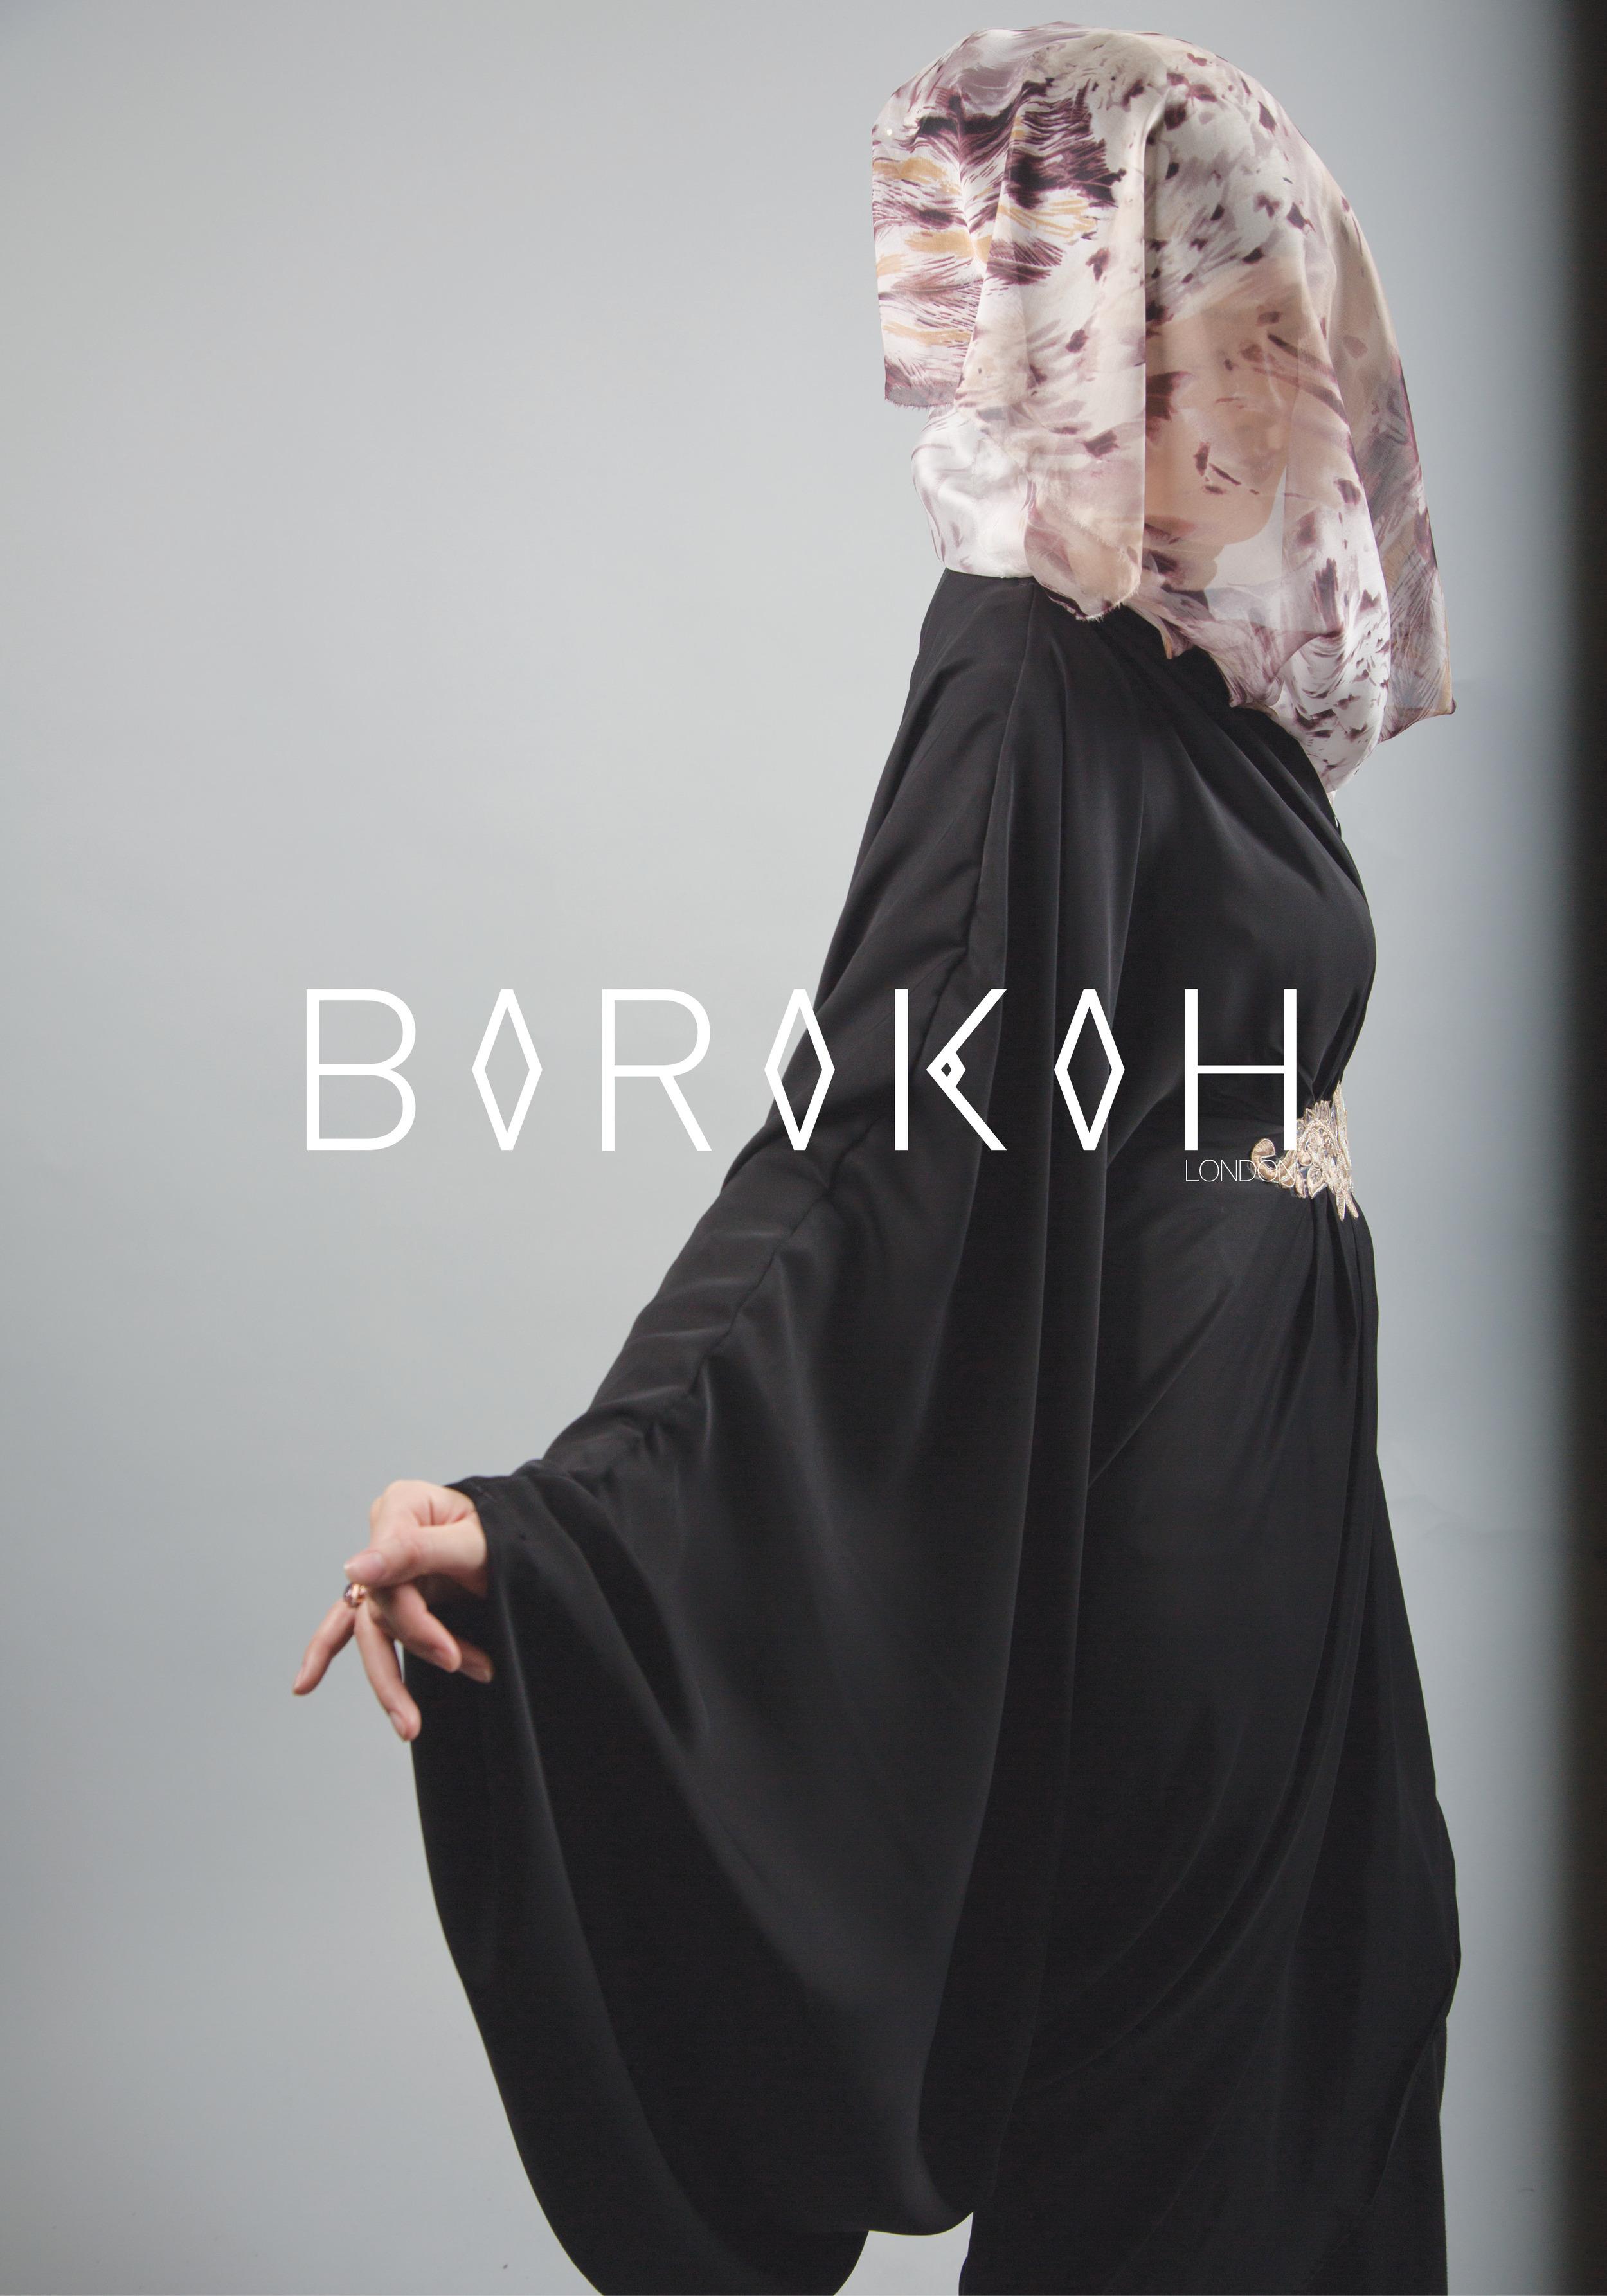 BARAKAH POSTERS2.jpg